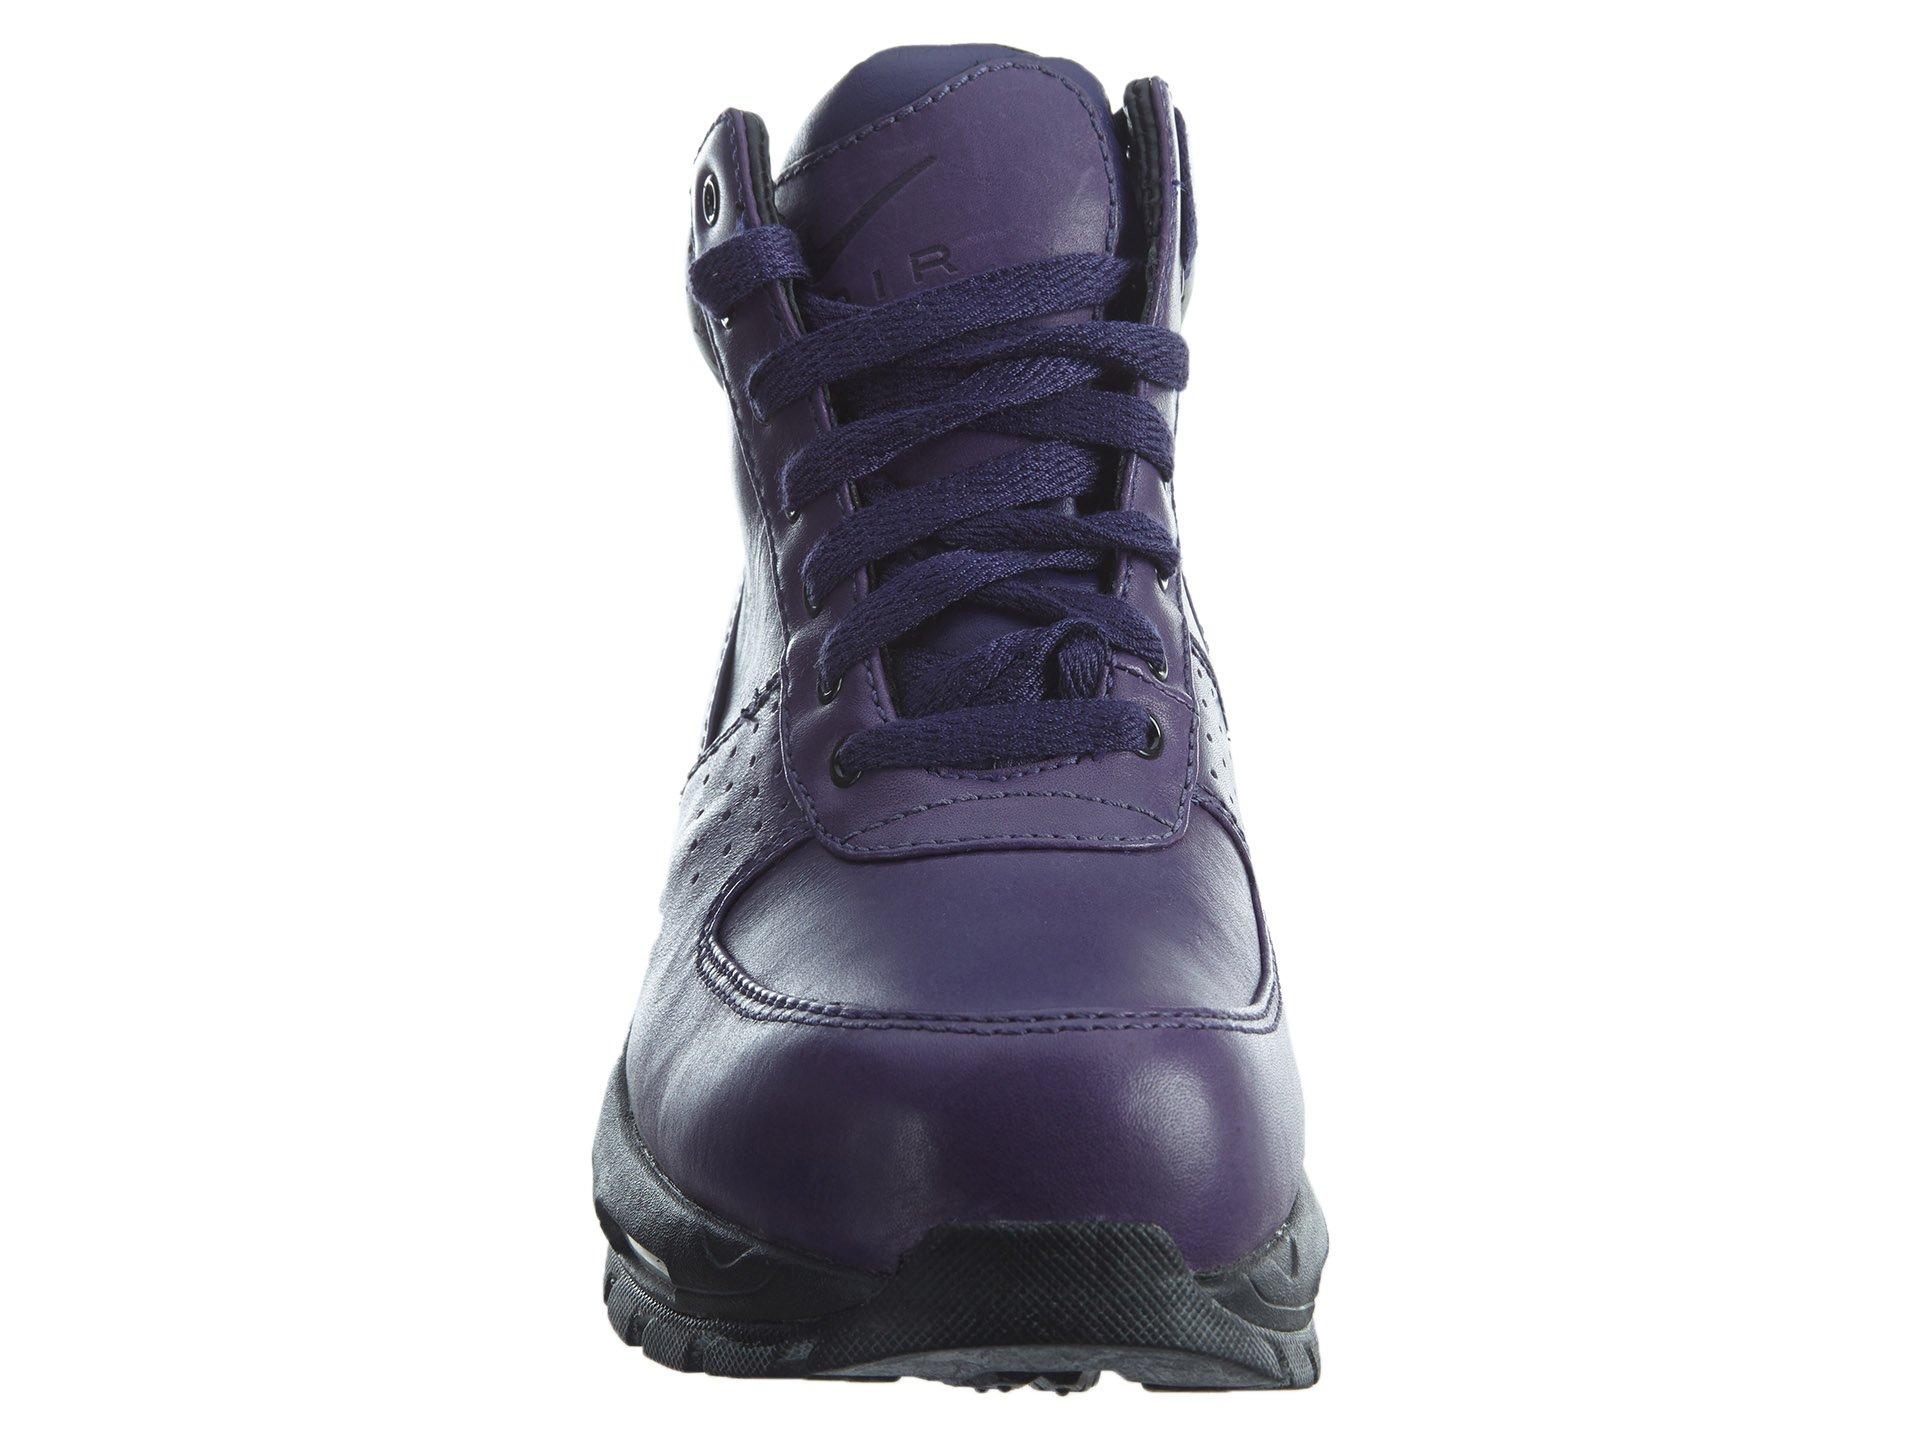 Nike Air Max Goadome (GS) ACG Big Kids Boots 311567-500 Ink 4 M US by Nike (Image #5)